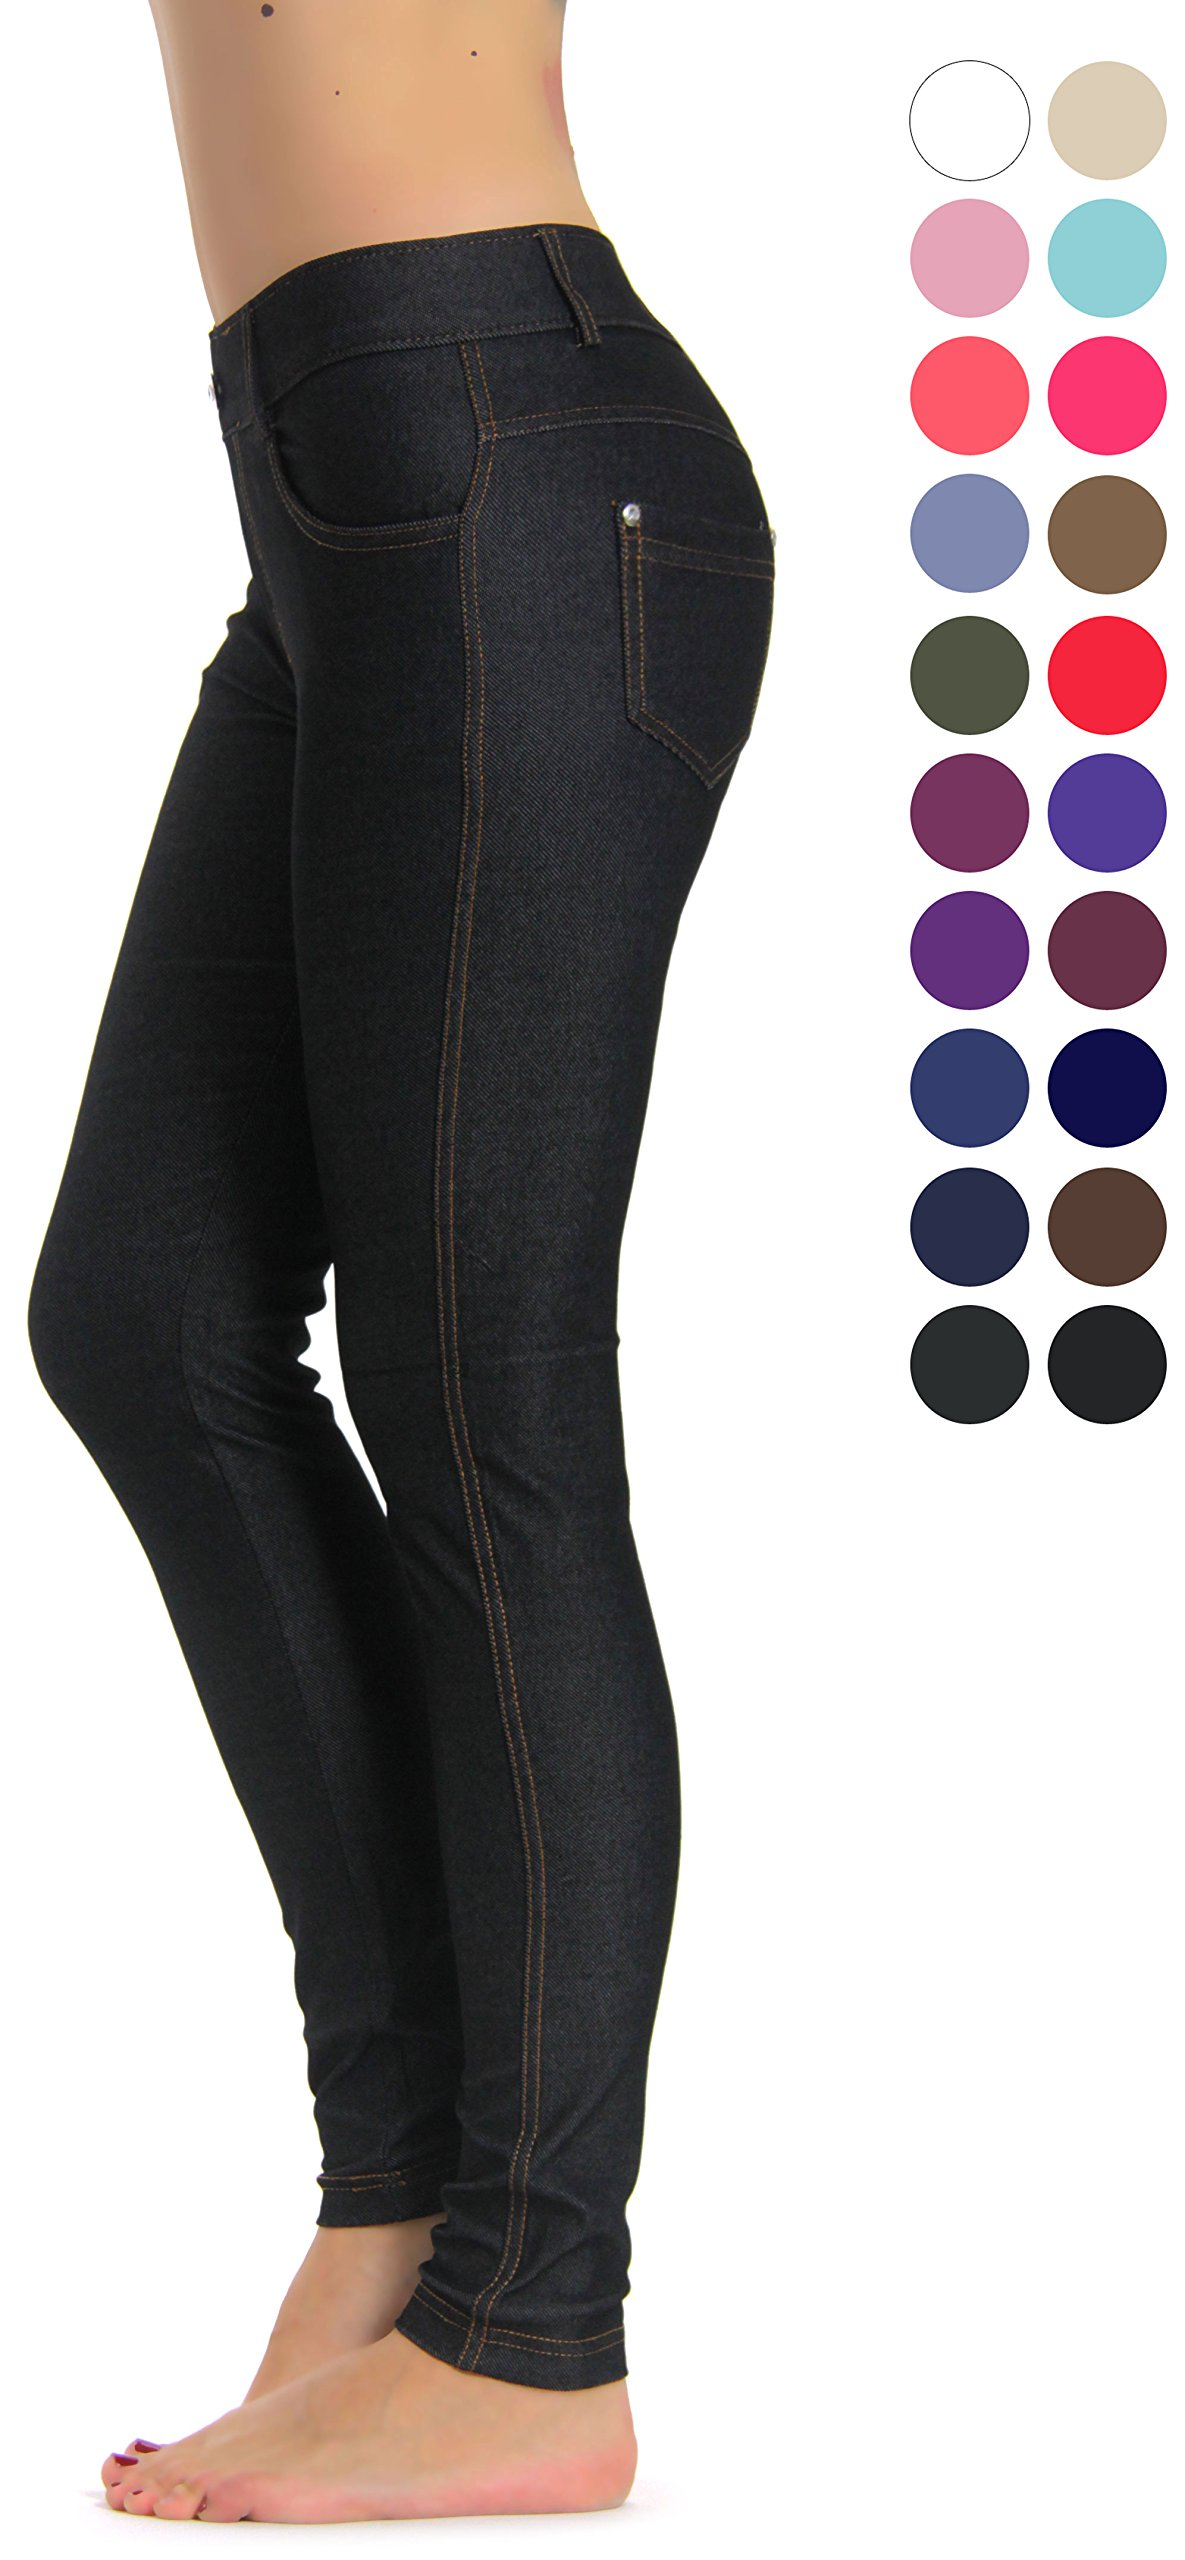 Prolific Health Women's Jean Look Jeggings Tights Yoga Many Colors Spandex Leggings Pants S-XXL (Large, Black Type2)